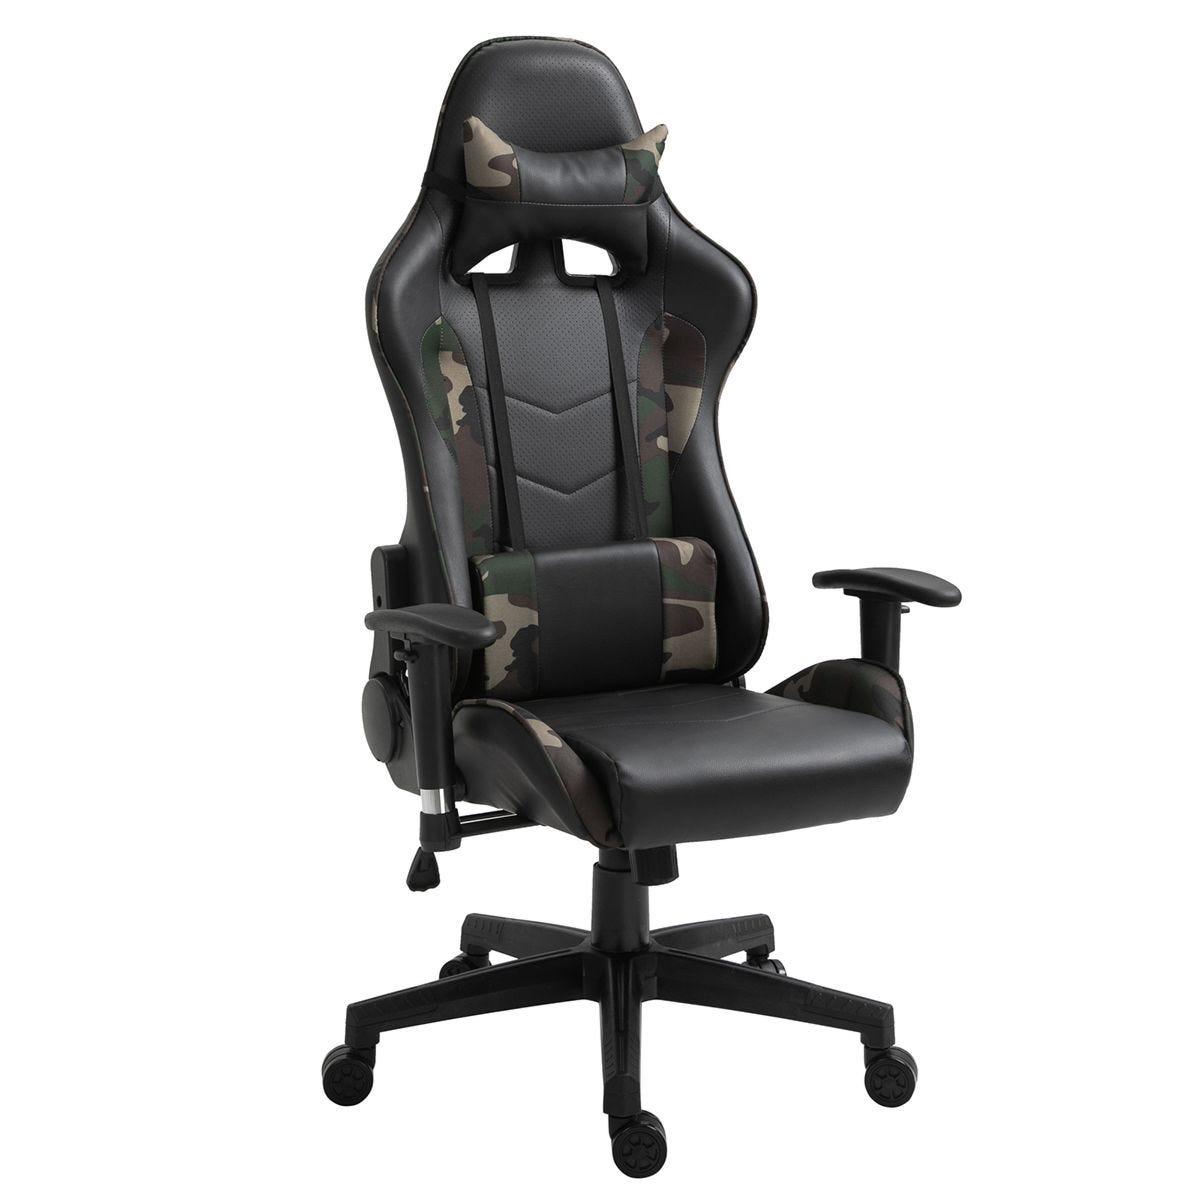 Equinox Camo PU Leather Gaming Chair with Vibrating Lumbar Cushion - Black/Green